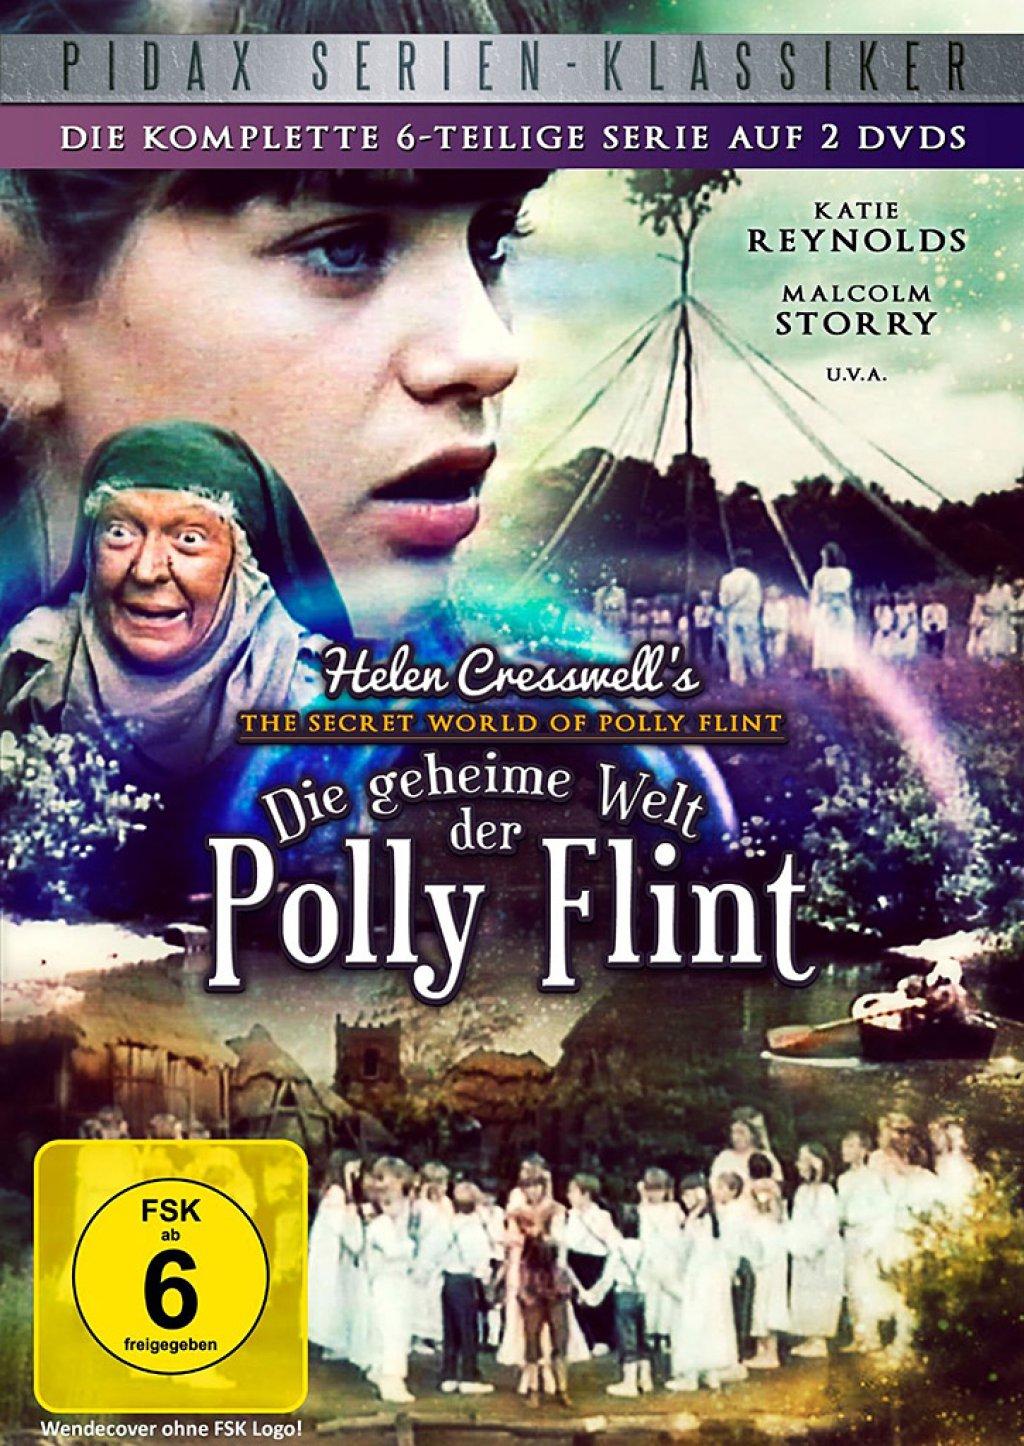 Die geheime Welt der Polly Flint - Pidax Serien-Klassiker (DVD)